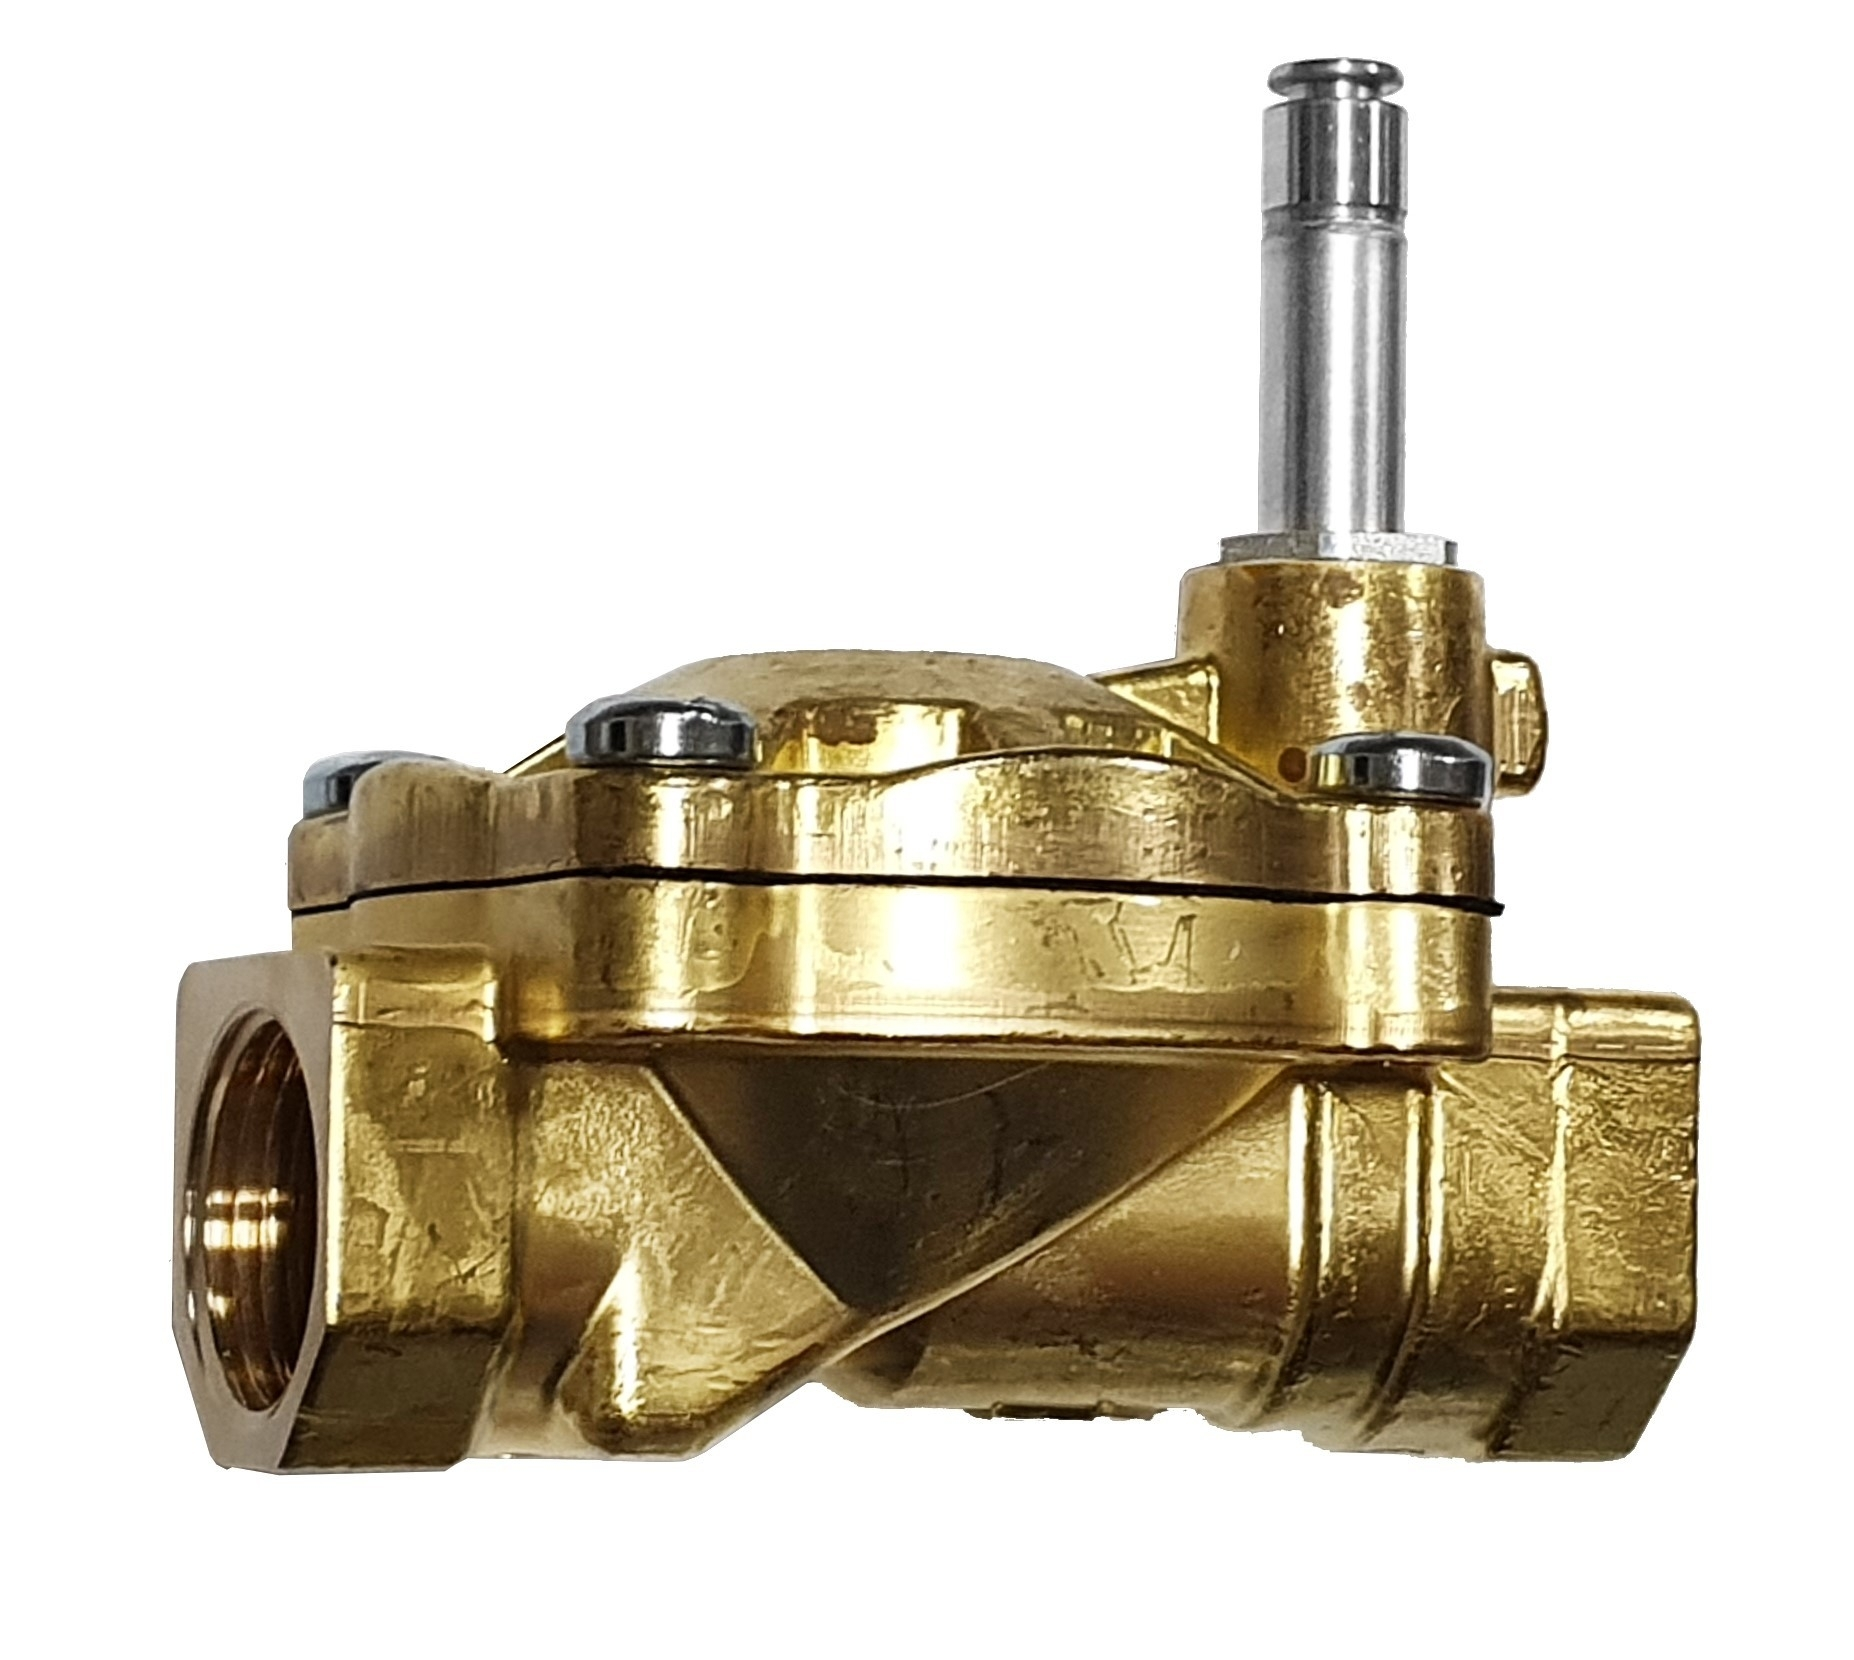 "<h4>Solenoid valves (1/2"" - 3/4"") - ASCO"